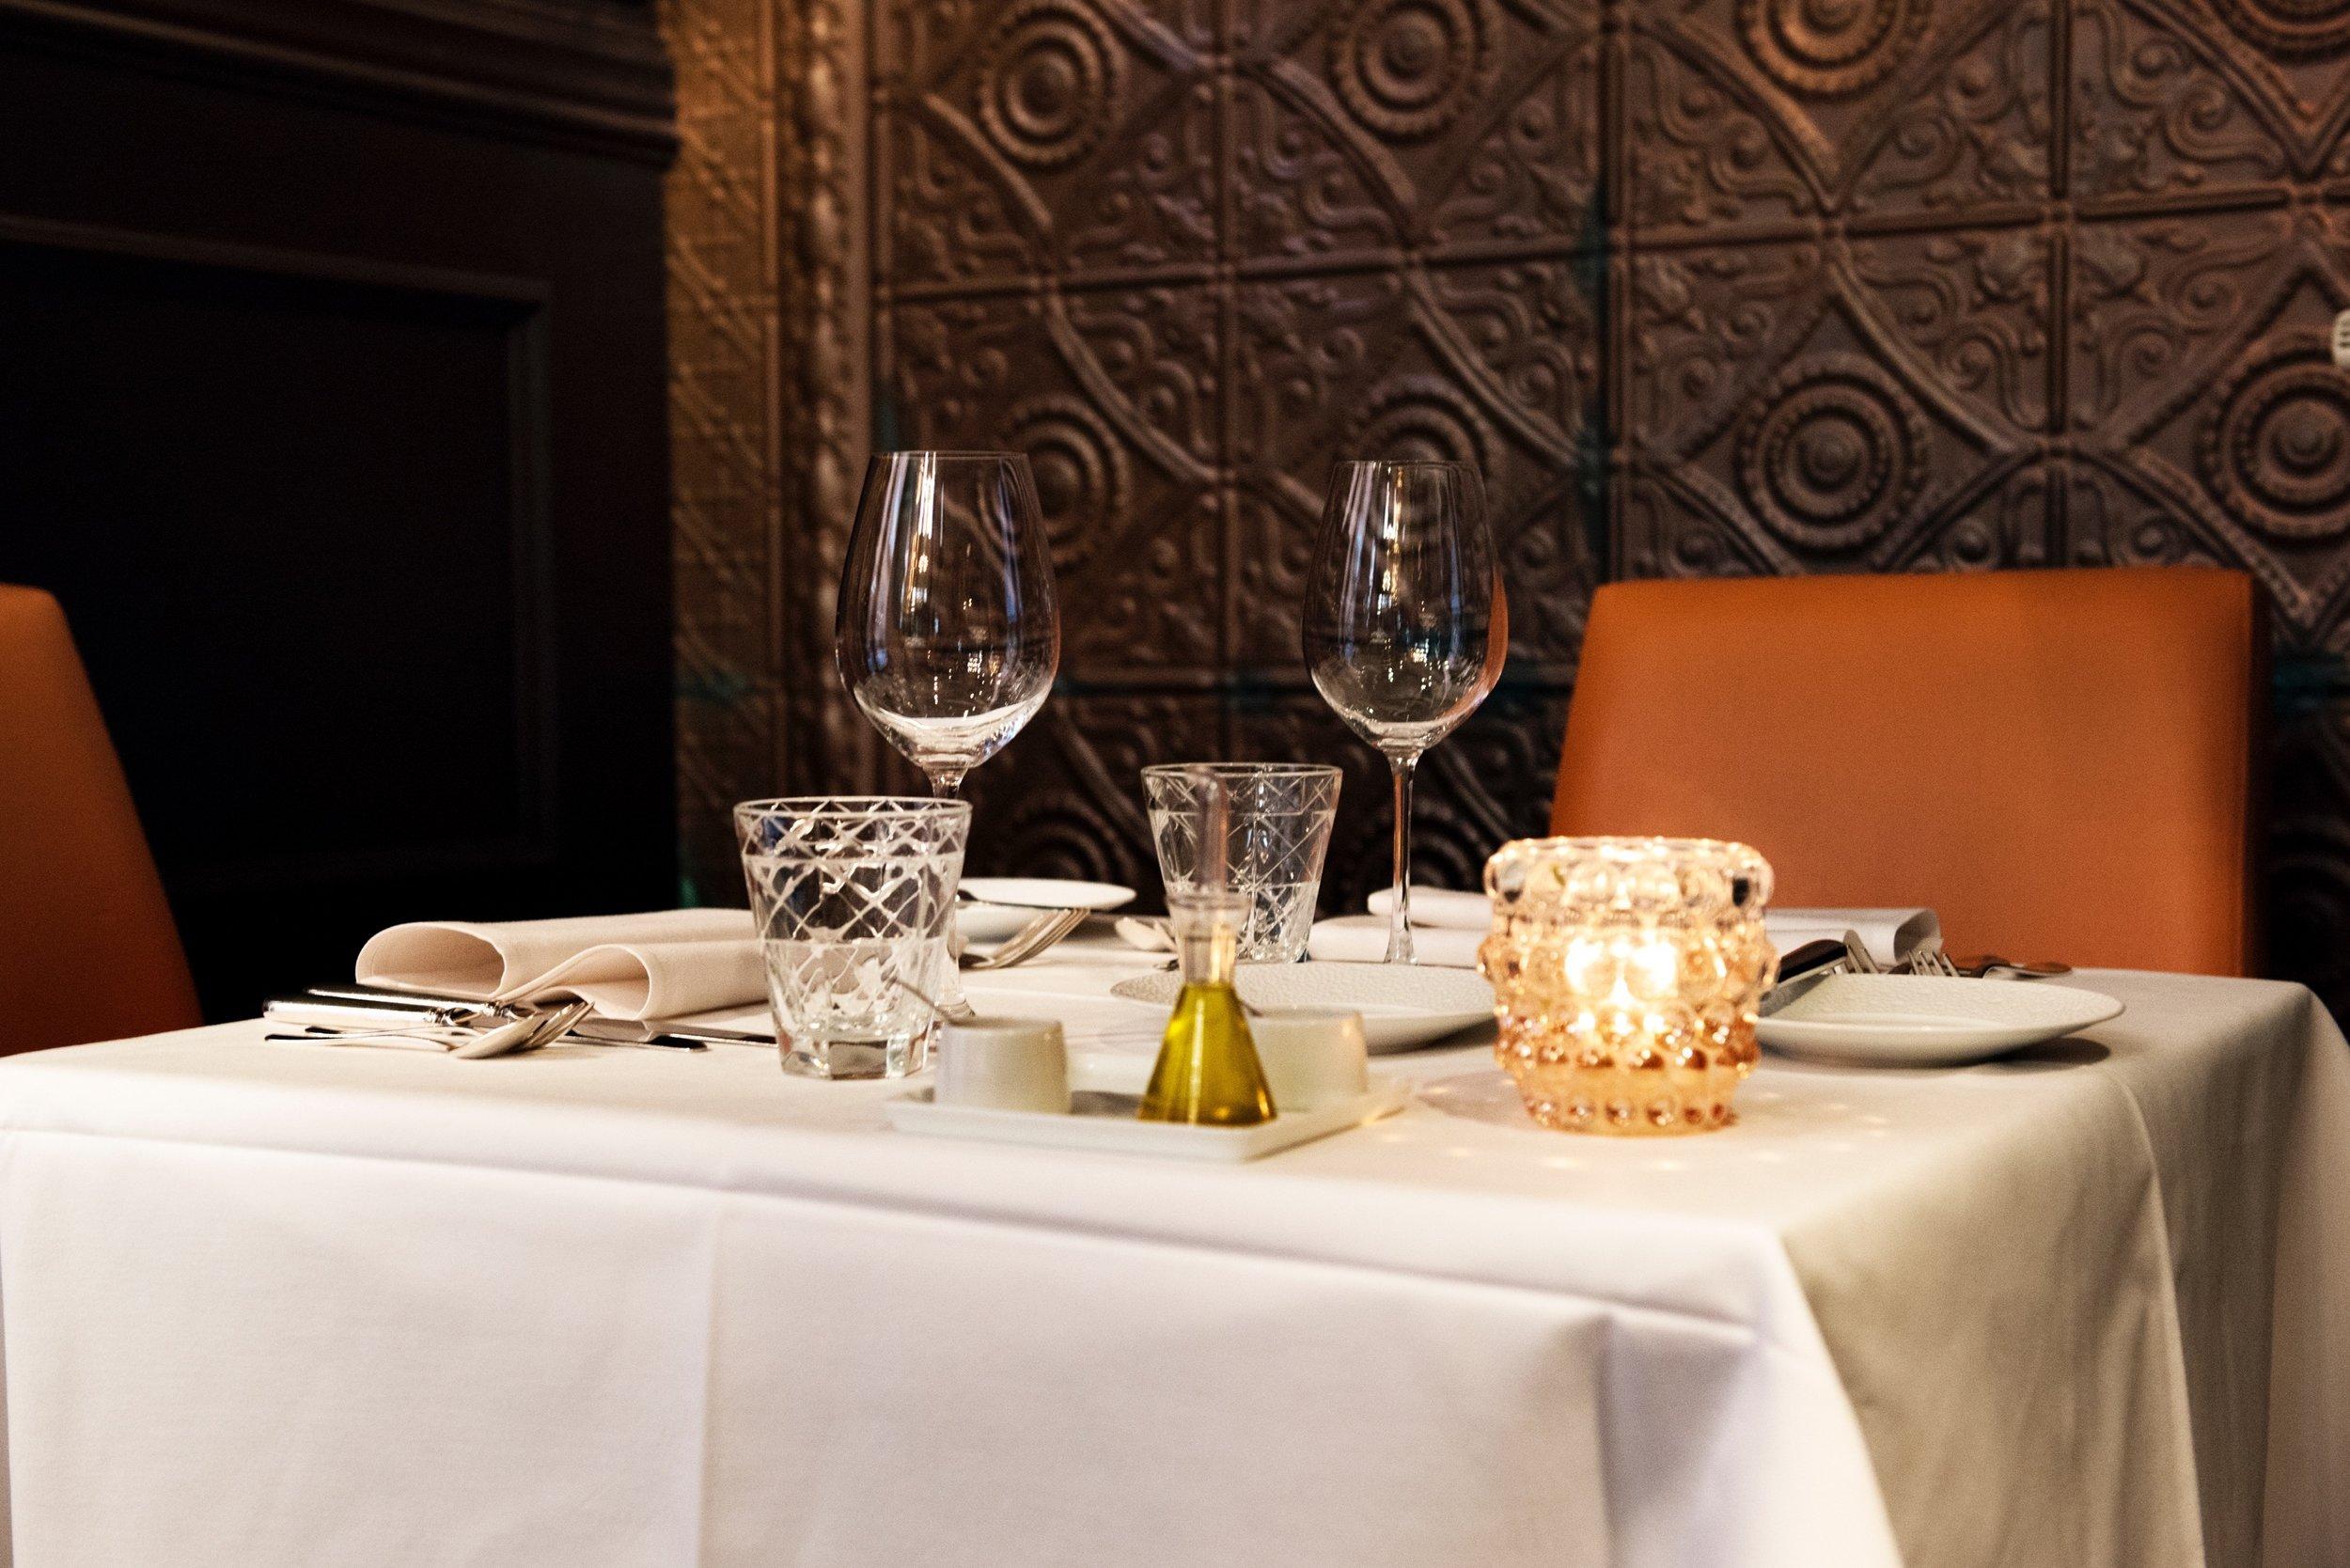 21 michelin restaurant the glorious antwerpen tablefever bart albrecht.jpg